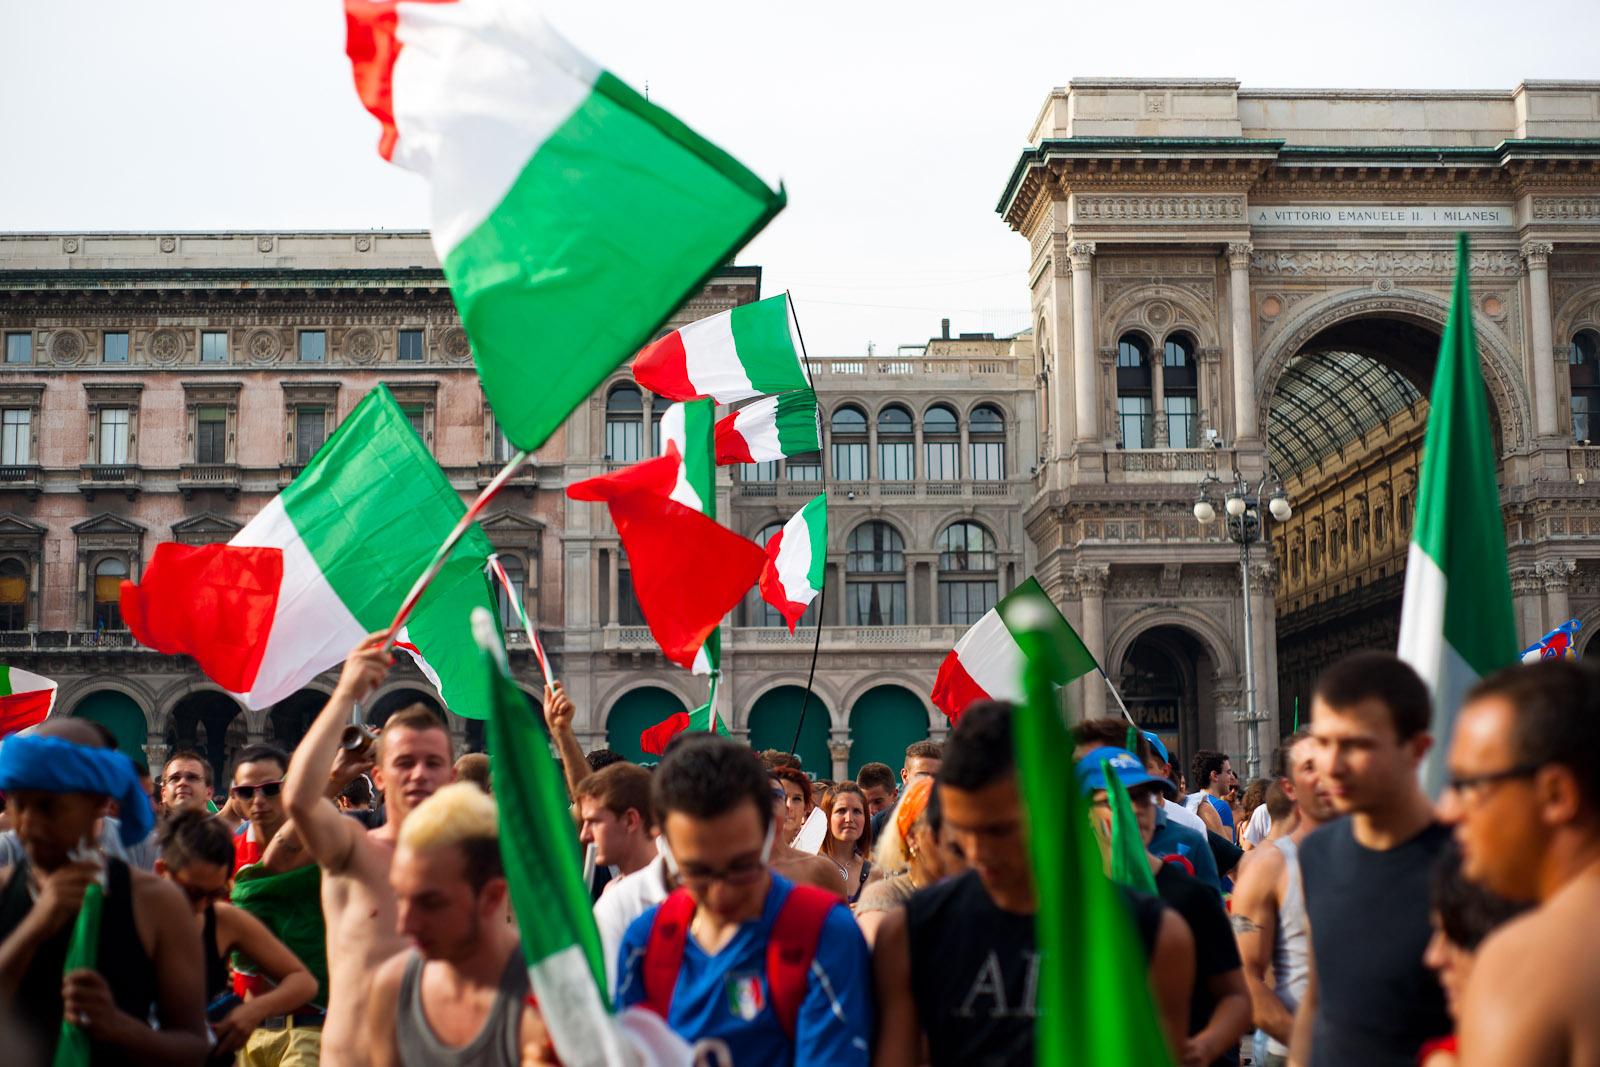 The three Italian colors